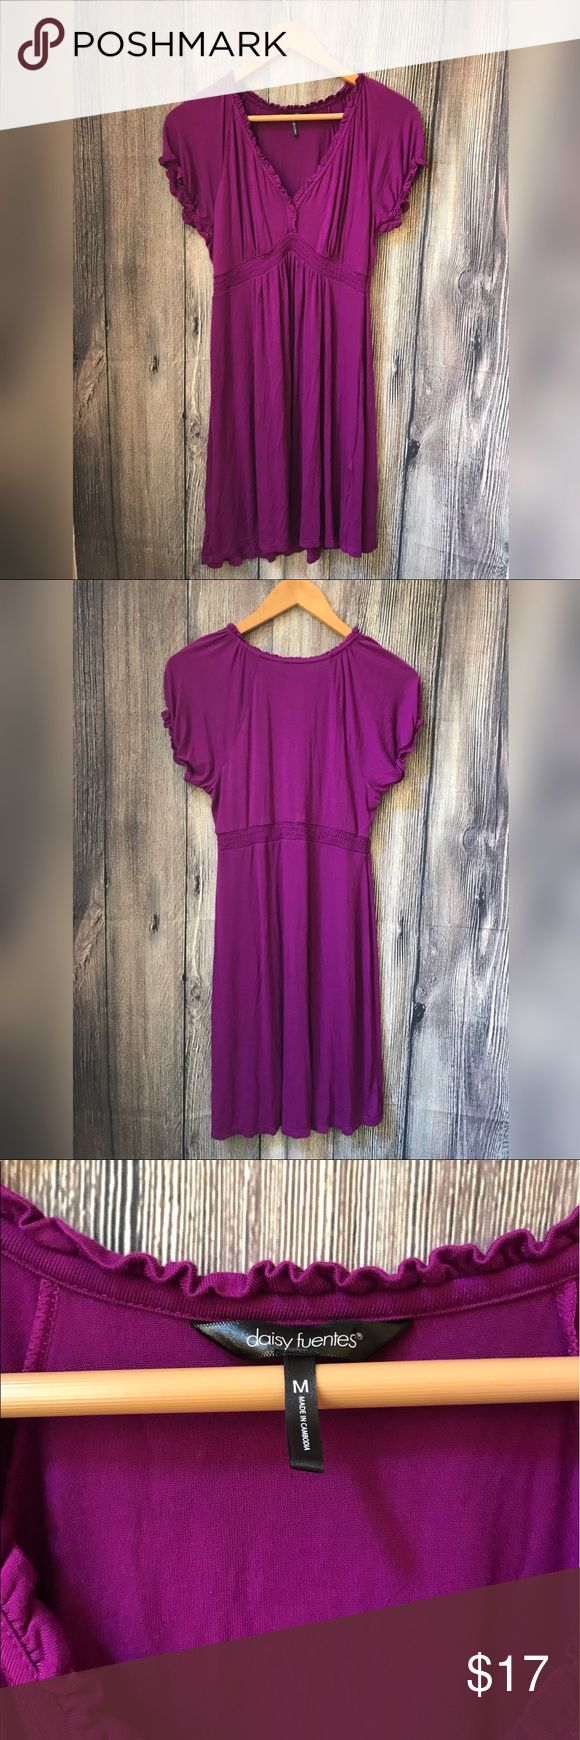 Daisy Fuentes purple dress Worn a few times, no flaws. Super comfy casual dress Daisy Fuentes Dresses Midi